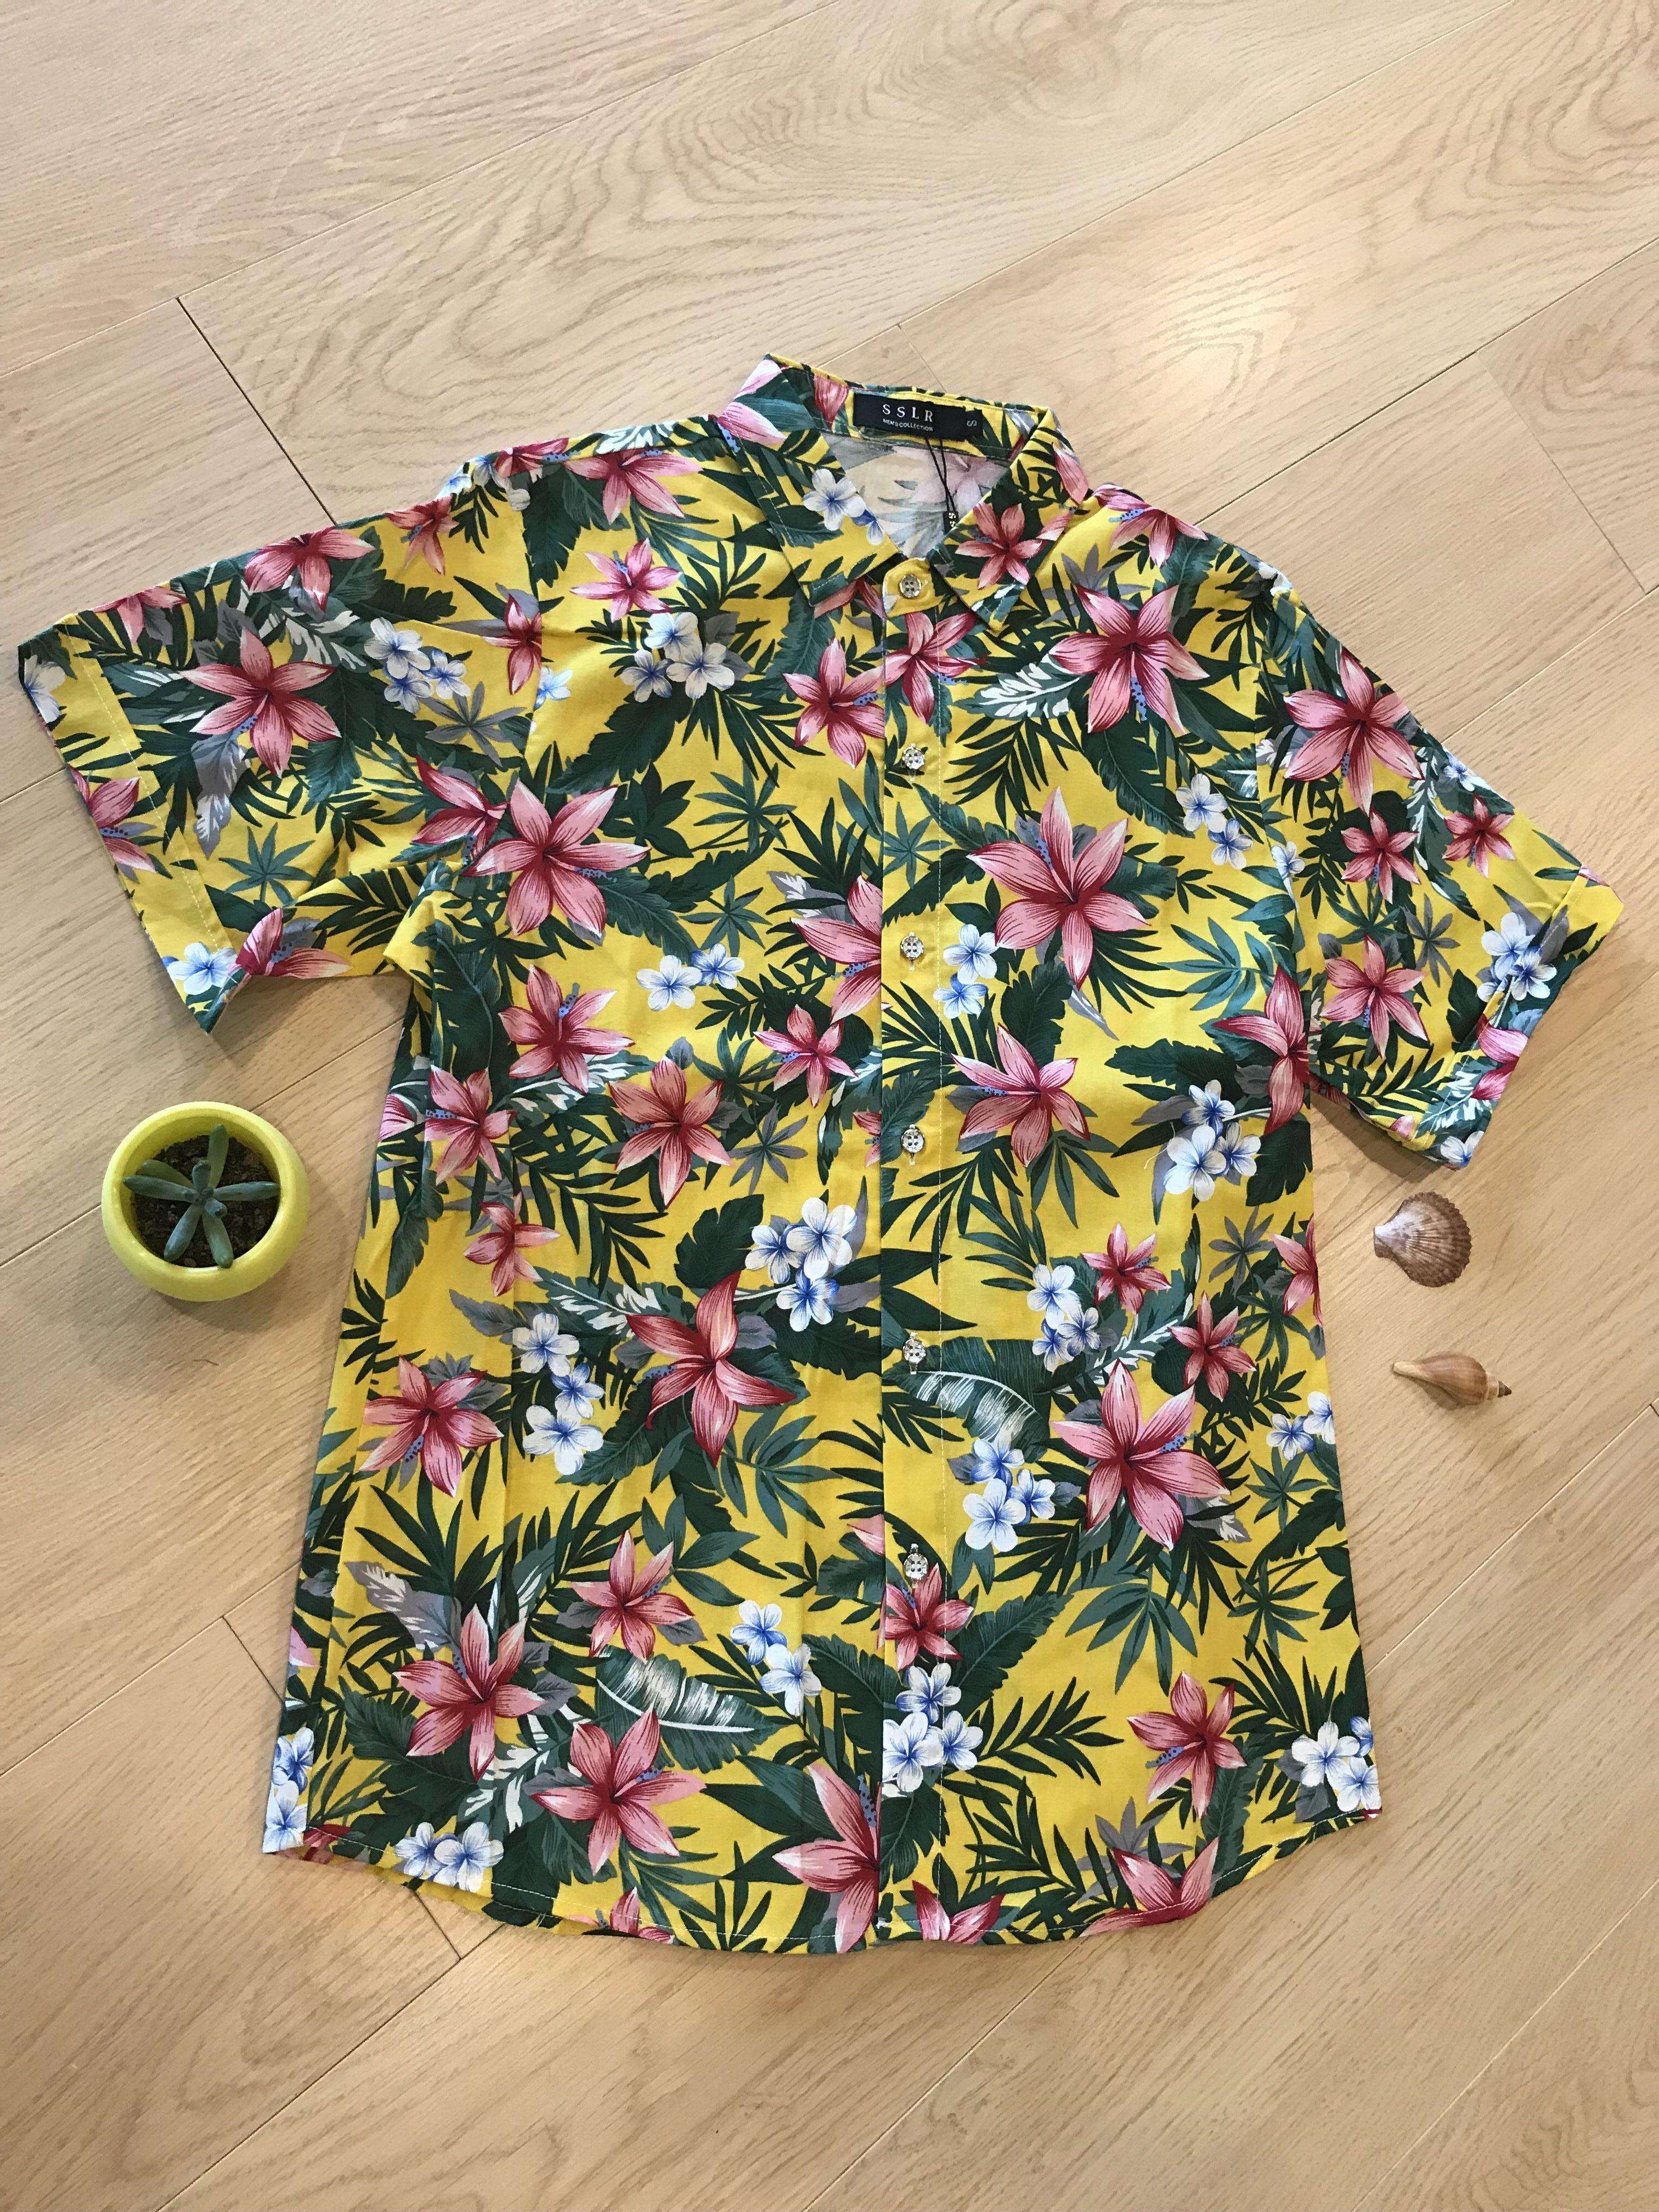 841337500 Bright yellow with flower and leaf print Hawaiian shirt #tropical shirt # Aloha party shirt